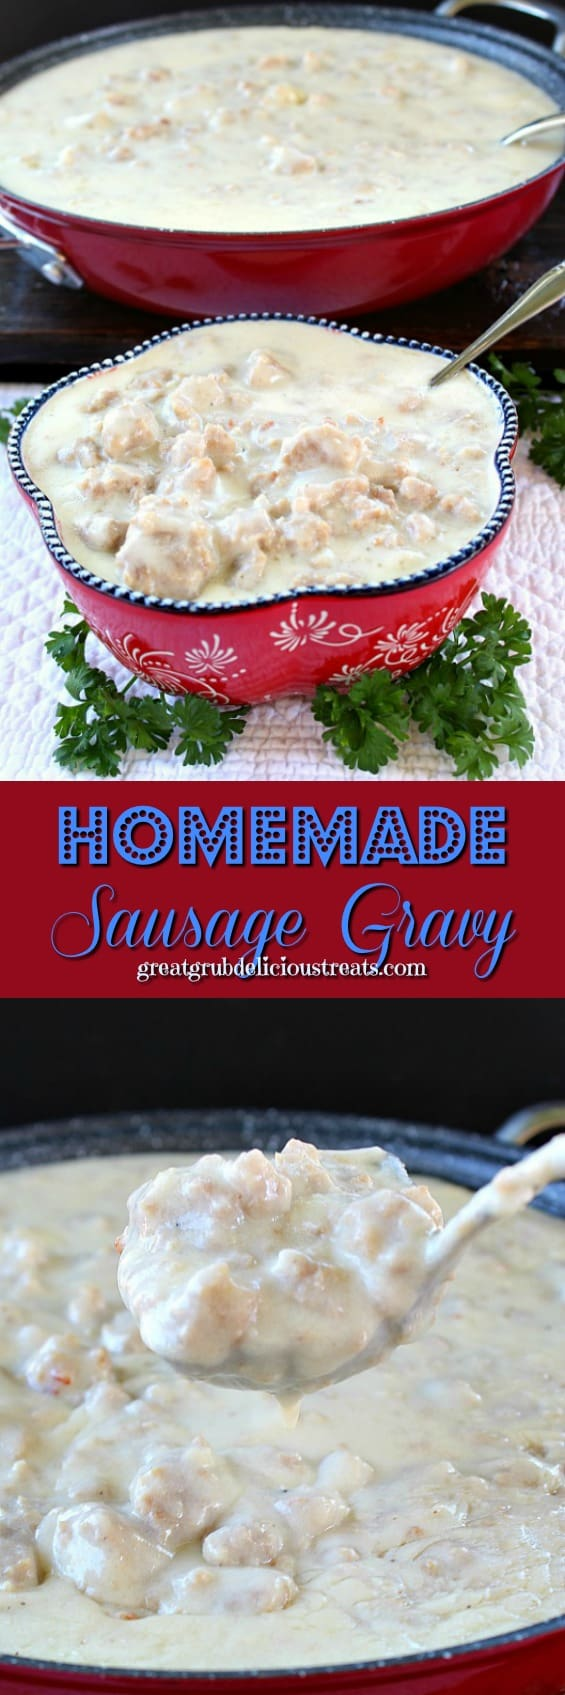 Homemade Sausage Gravy